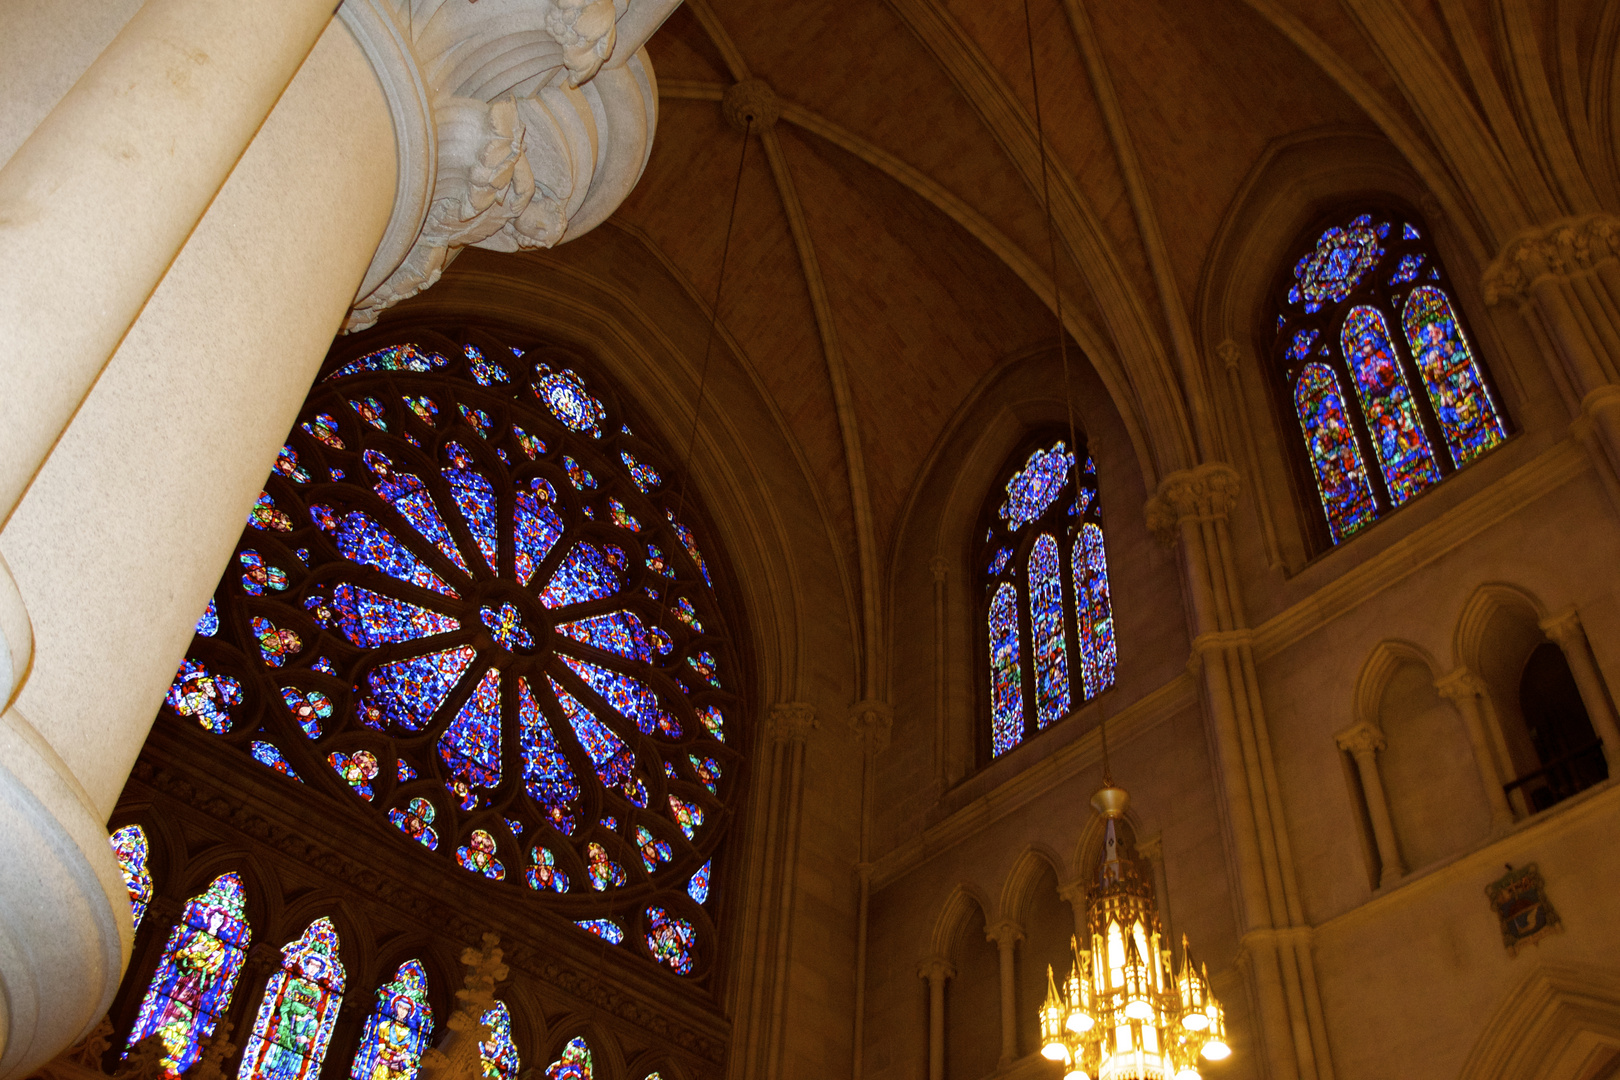 Cathedral Basilica of the Sacred Heart 89 Ridge Street Newark, NJ 07104